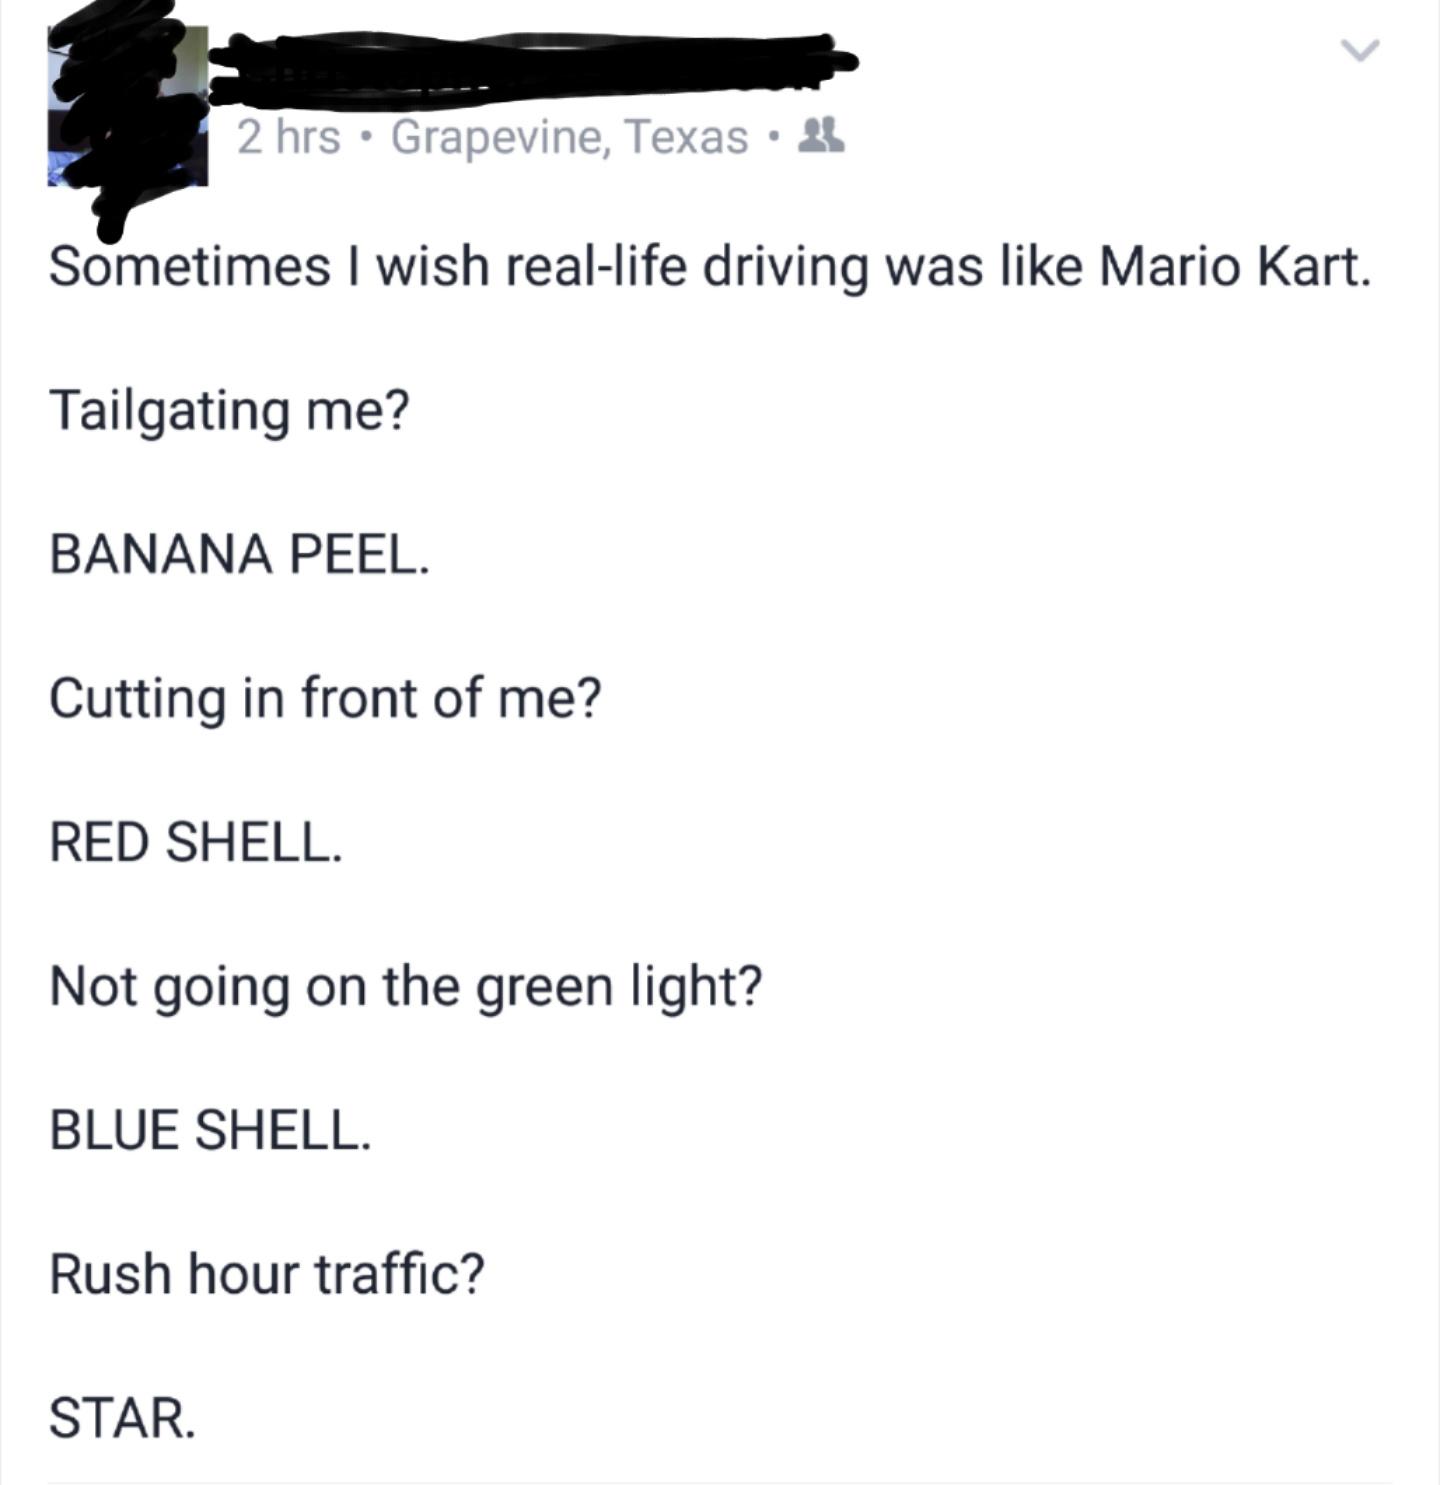 Mario kart IRL - meme